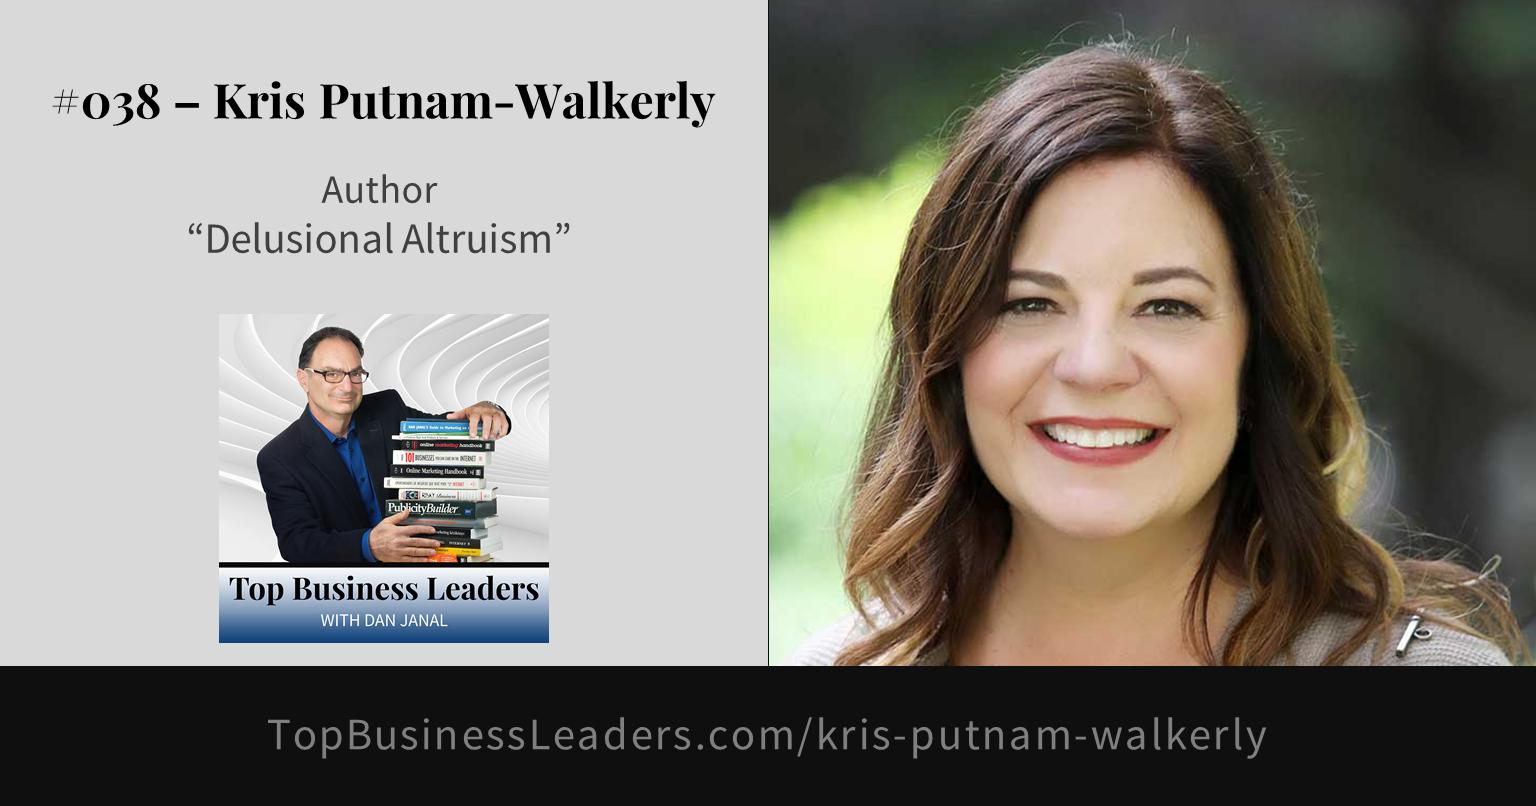 kris-putnam-walkerly-author-delusional-altruism